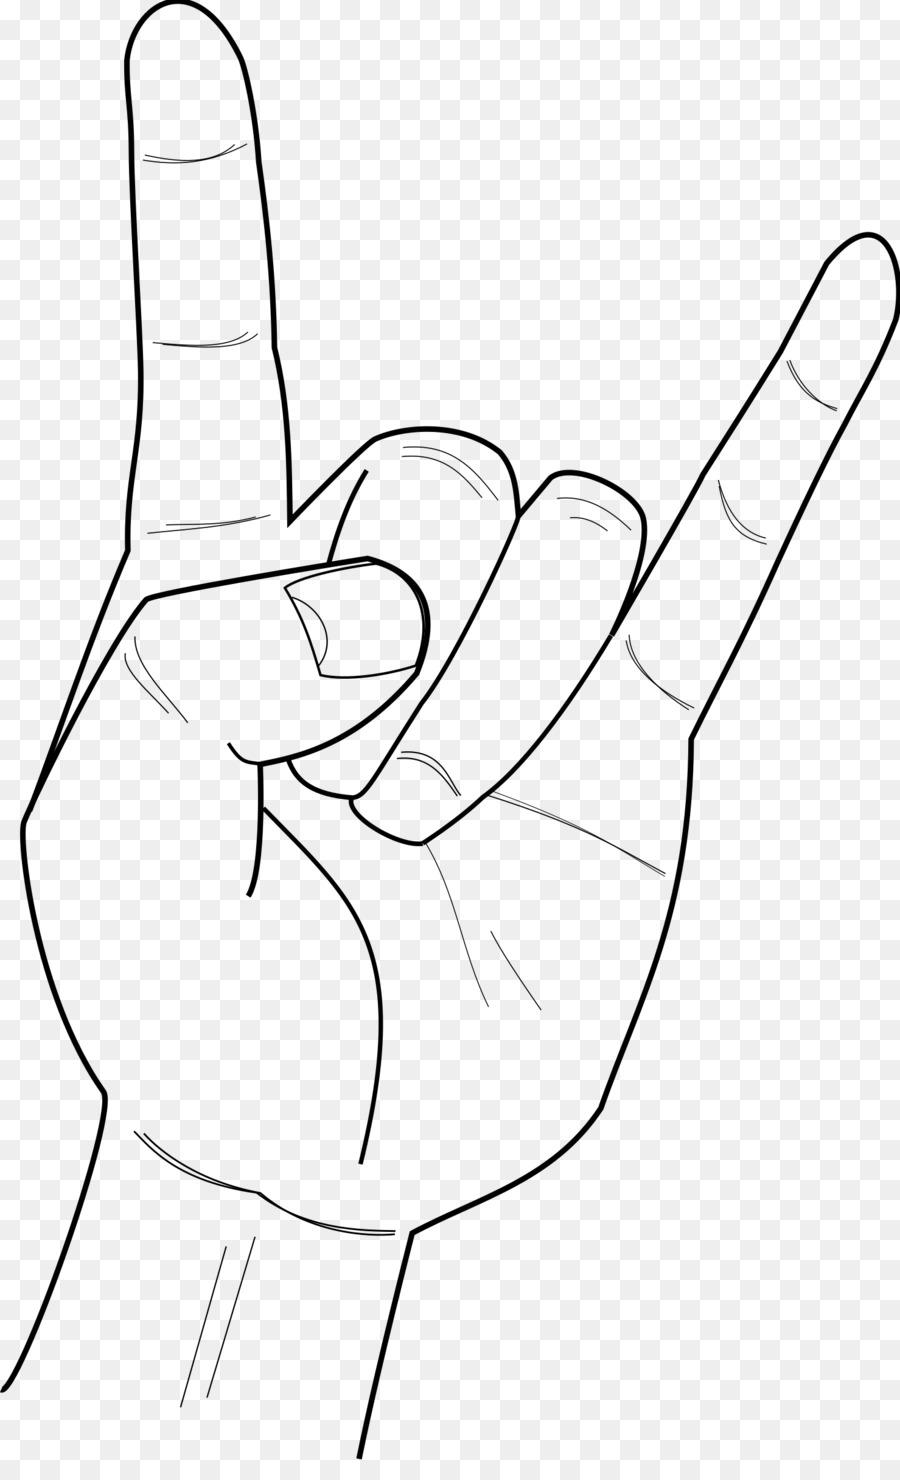 Hand transparent. Metal background clipart rock